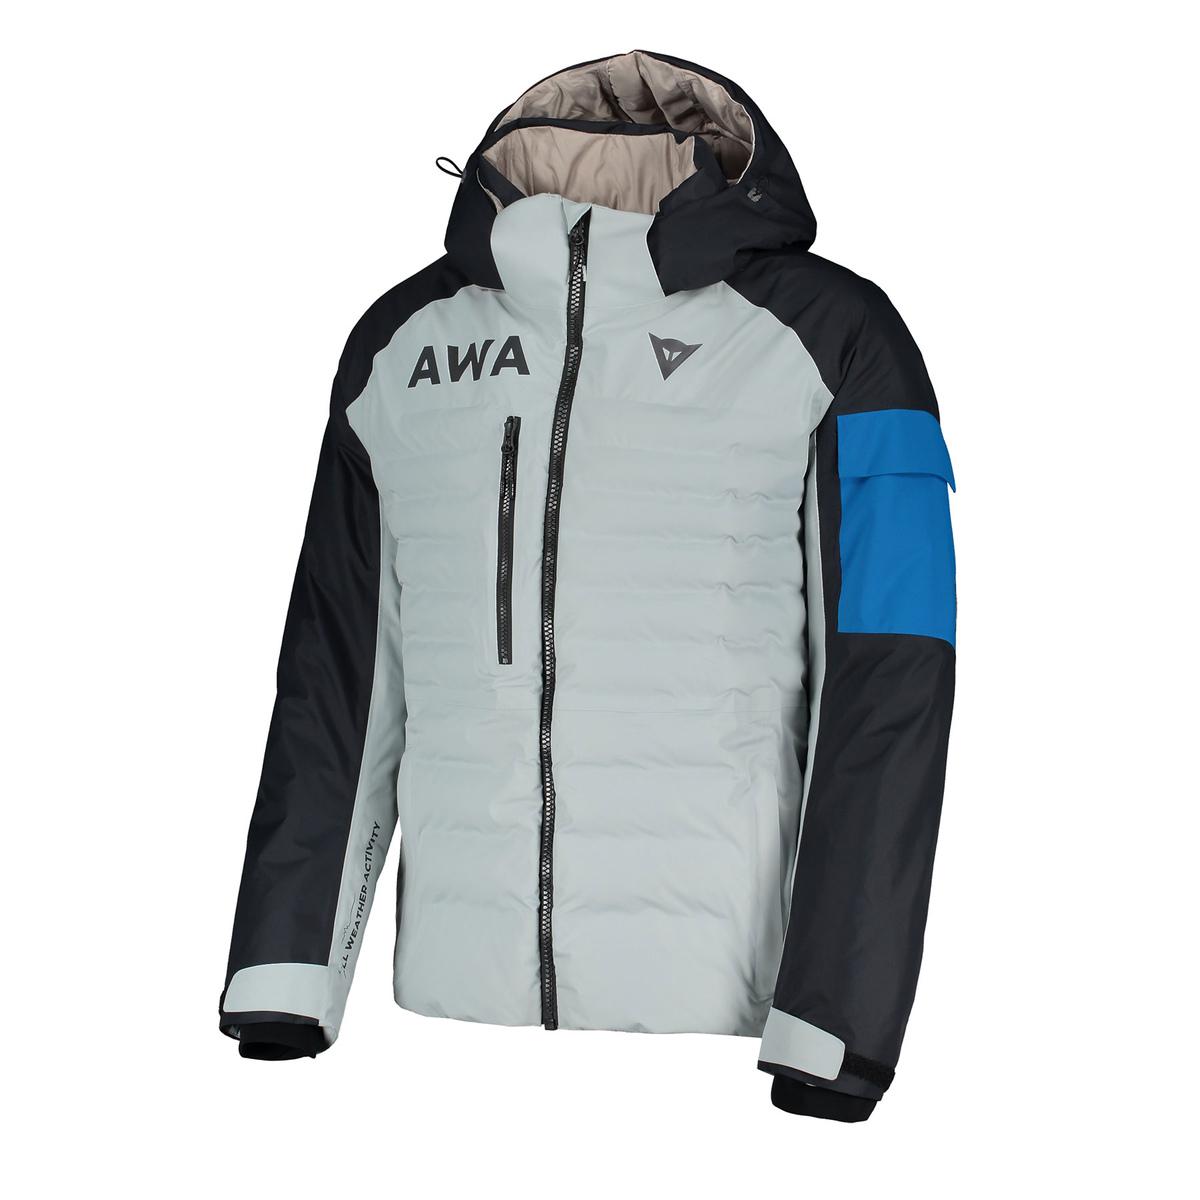 Prezzi Dainese giacca AWA BLACK